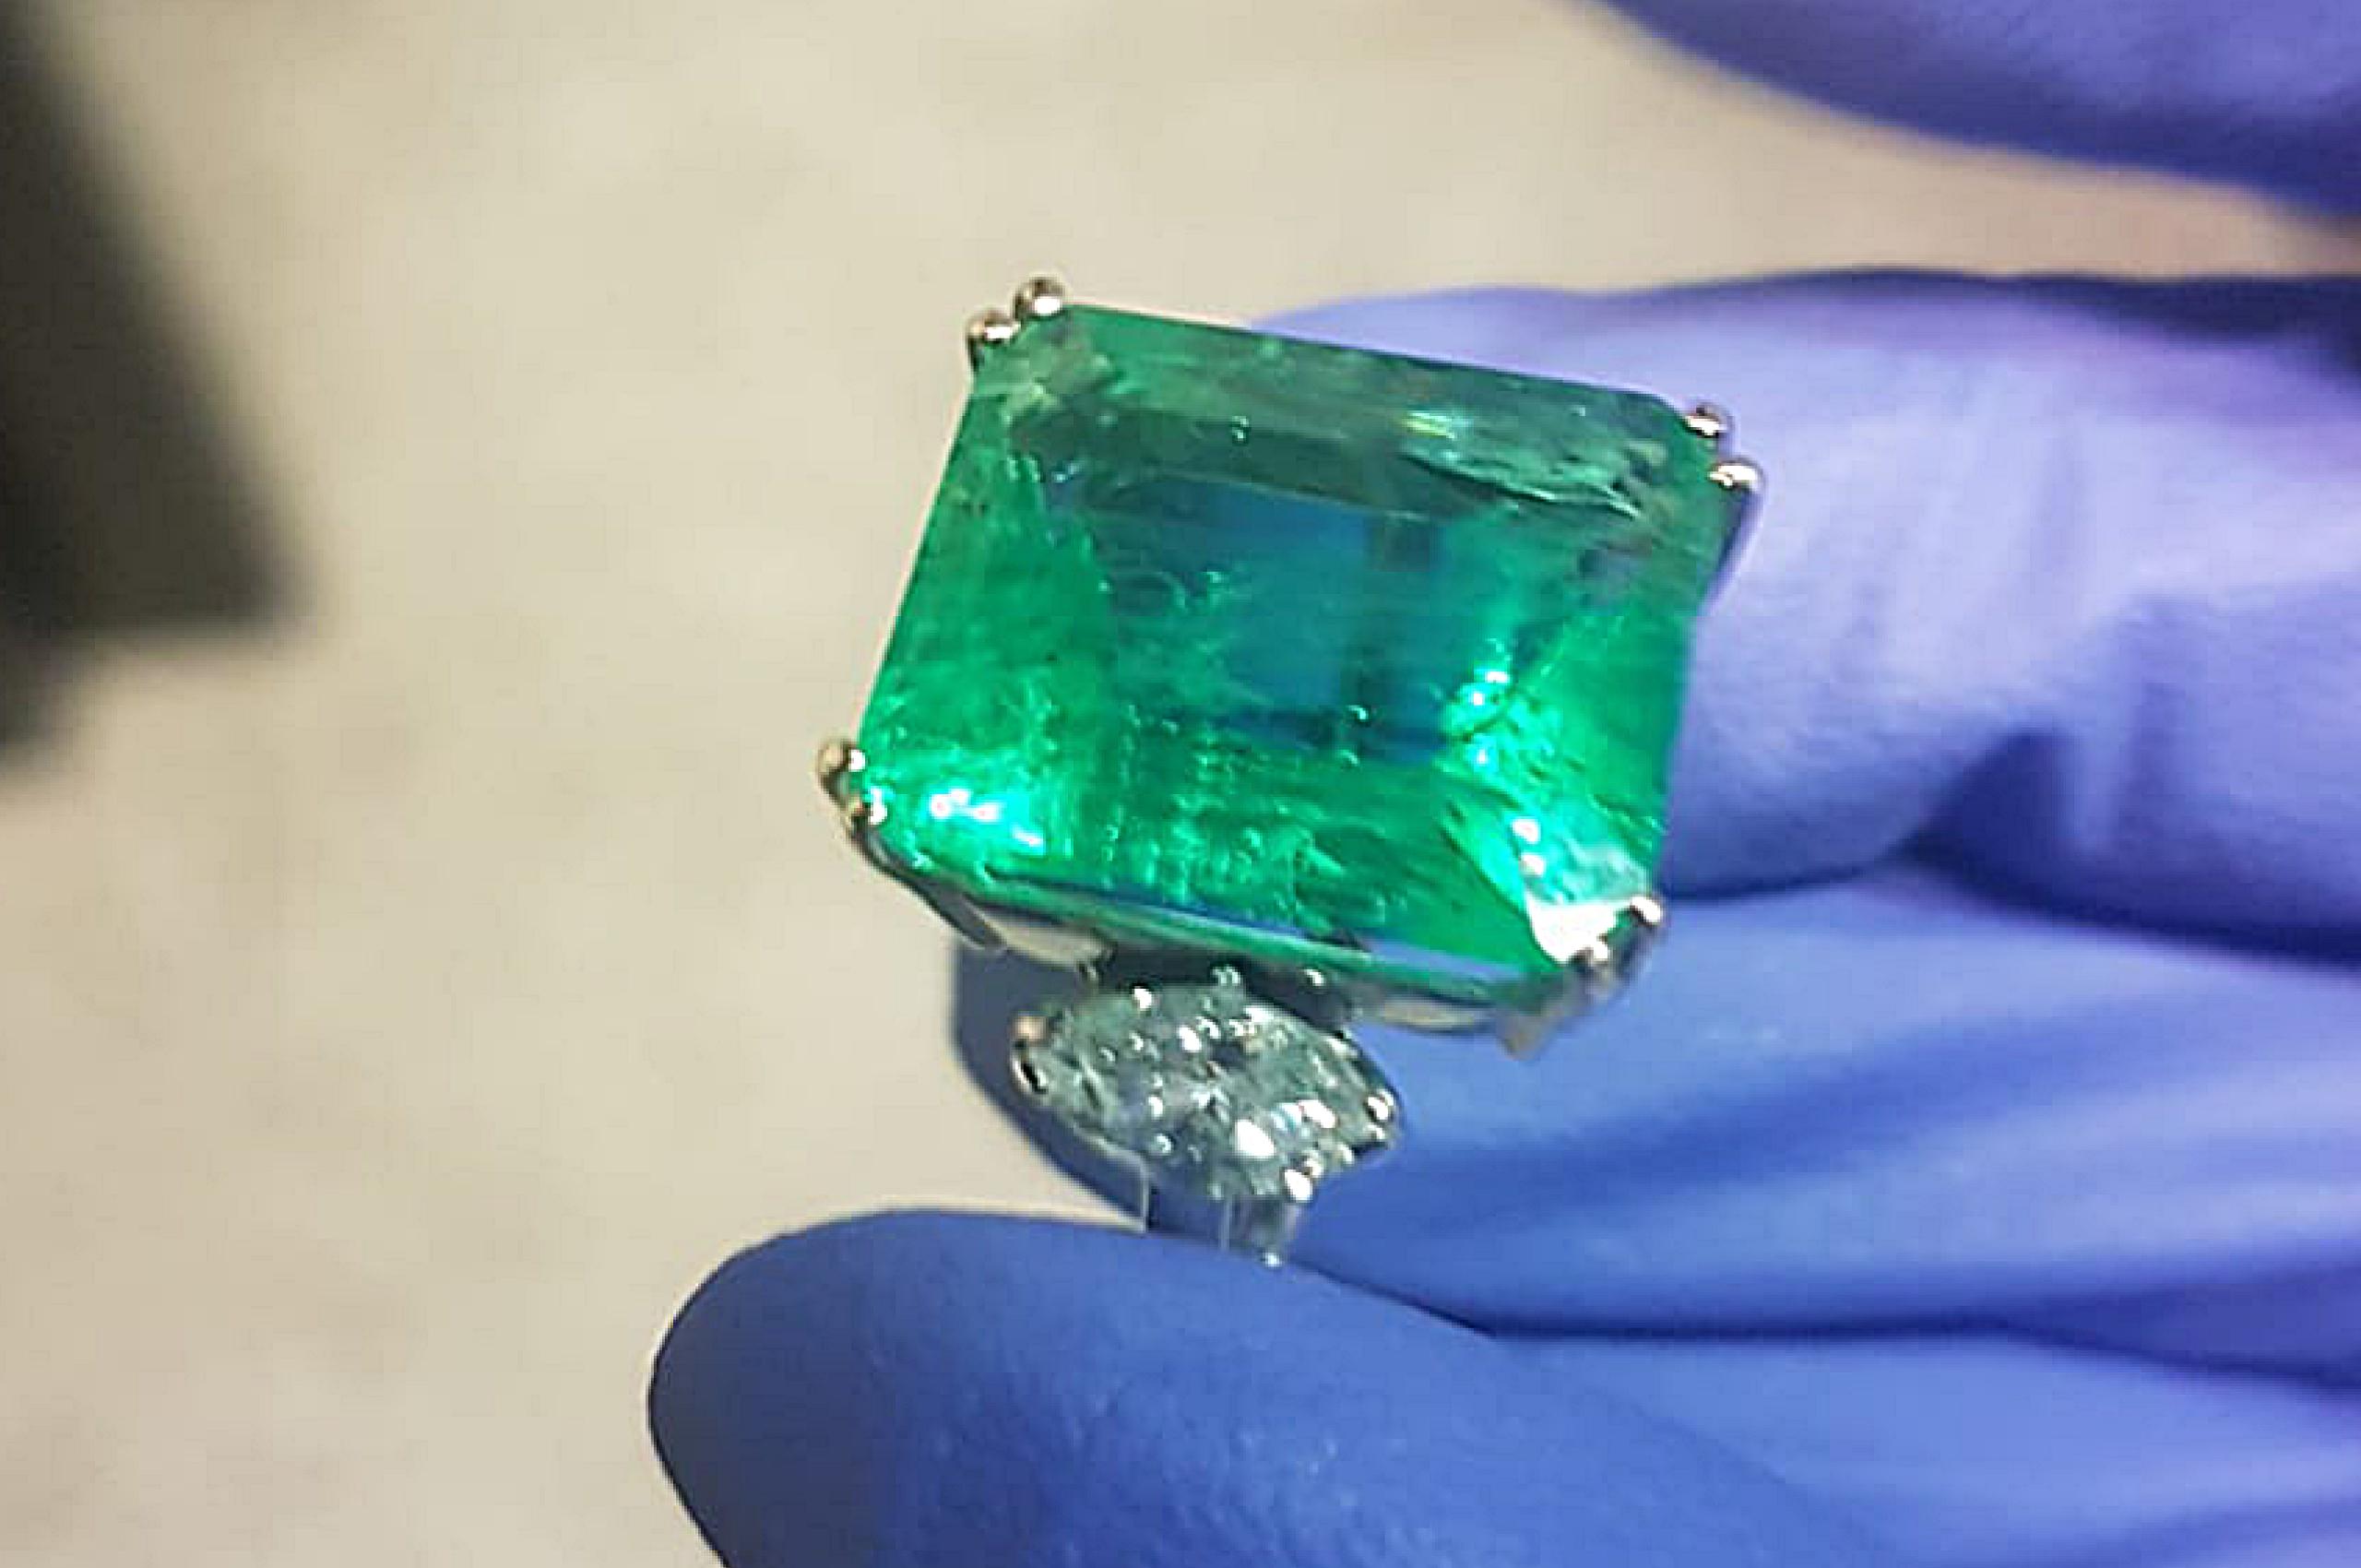 Glass, Imitation of Emerald. Photo by Fausta Aidala